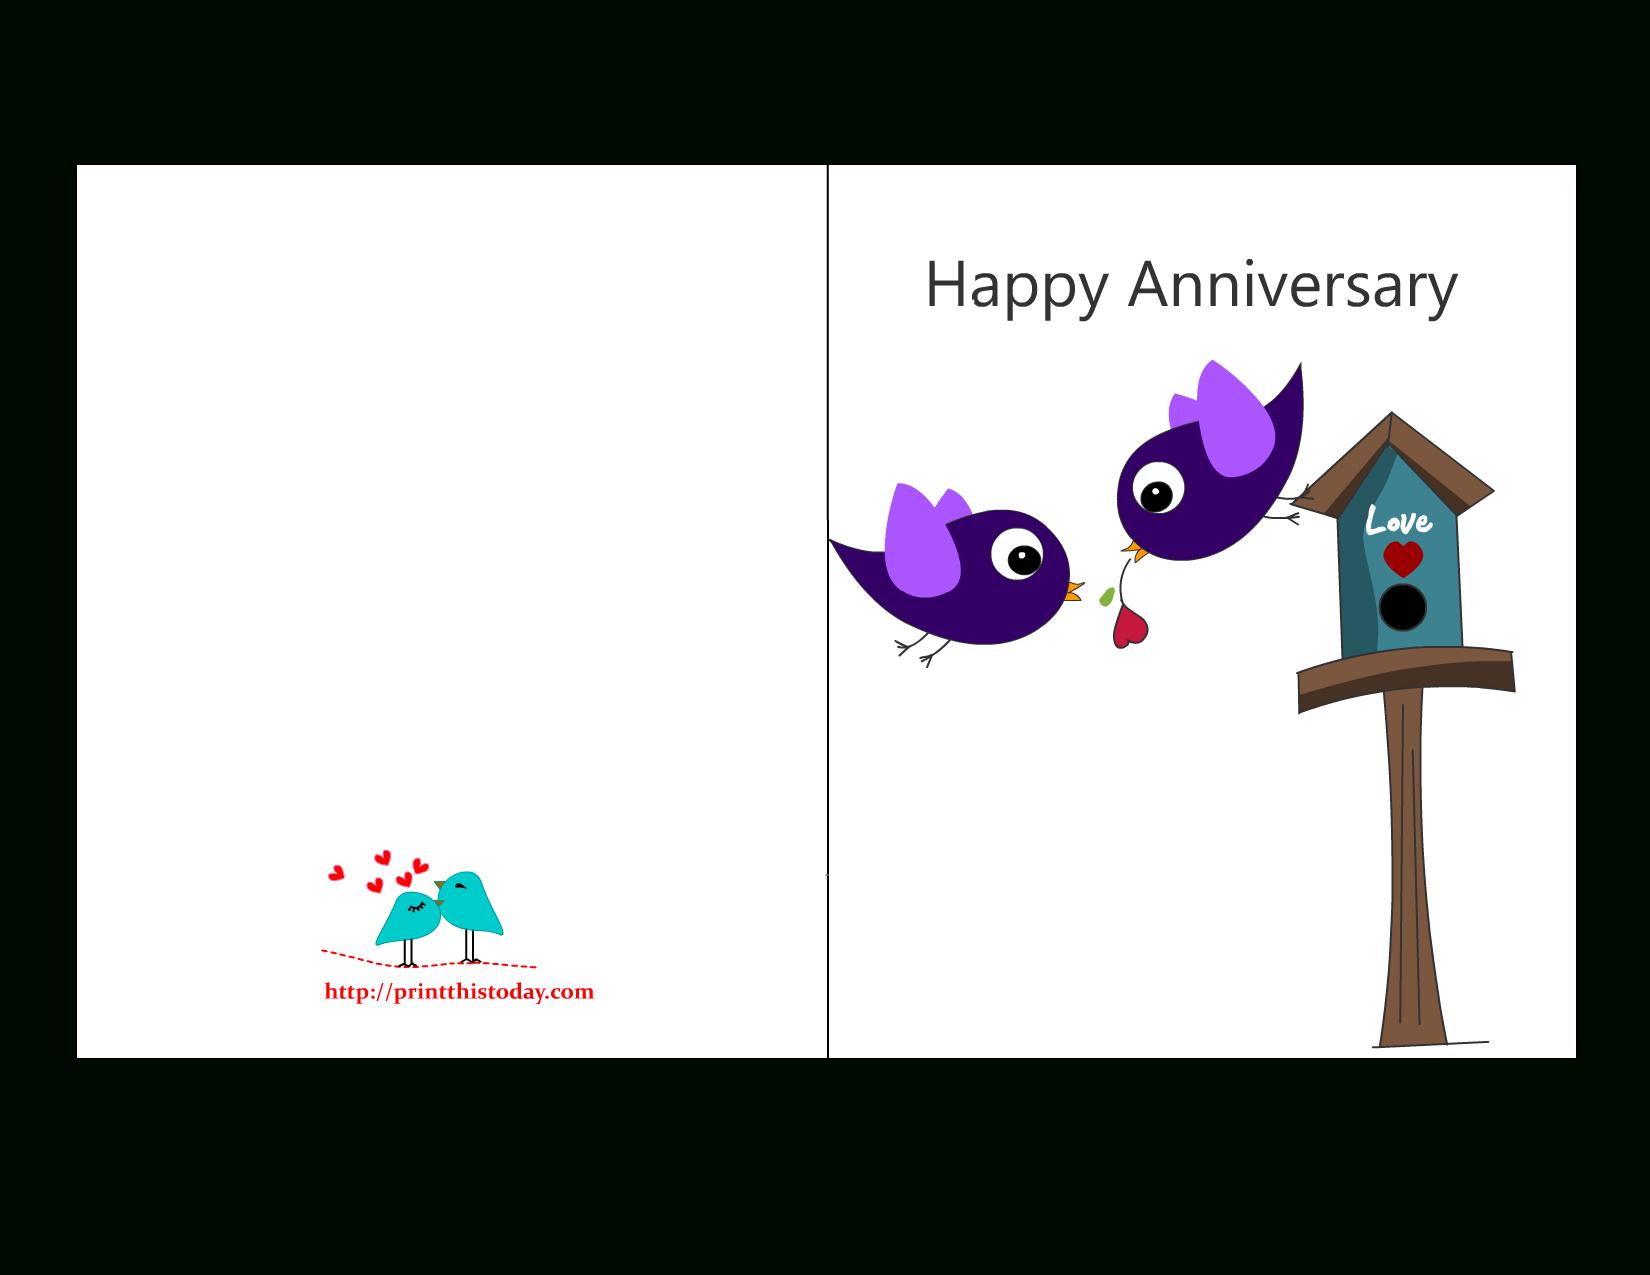 Free Anniversary Cards To Print | Free Printable Anniversary Cards - Free Printable 50Th Anniversary Cards